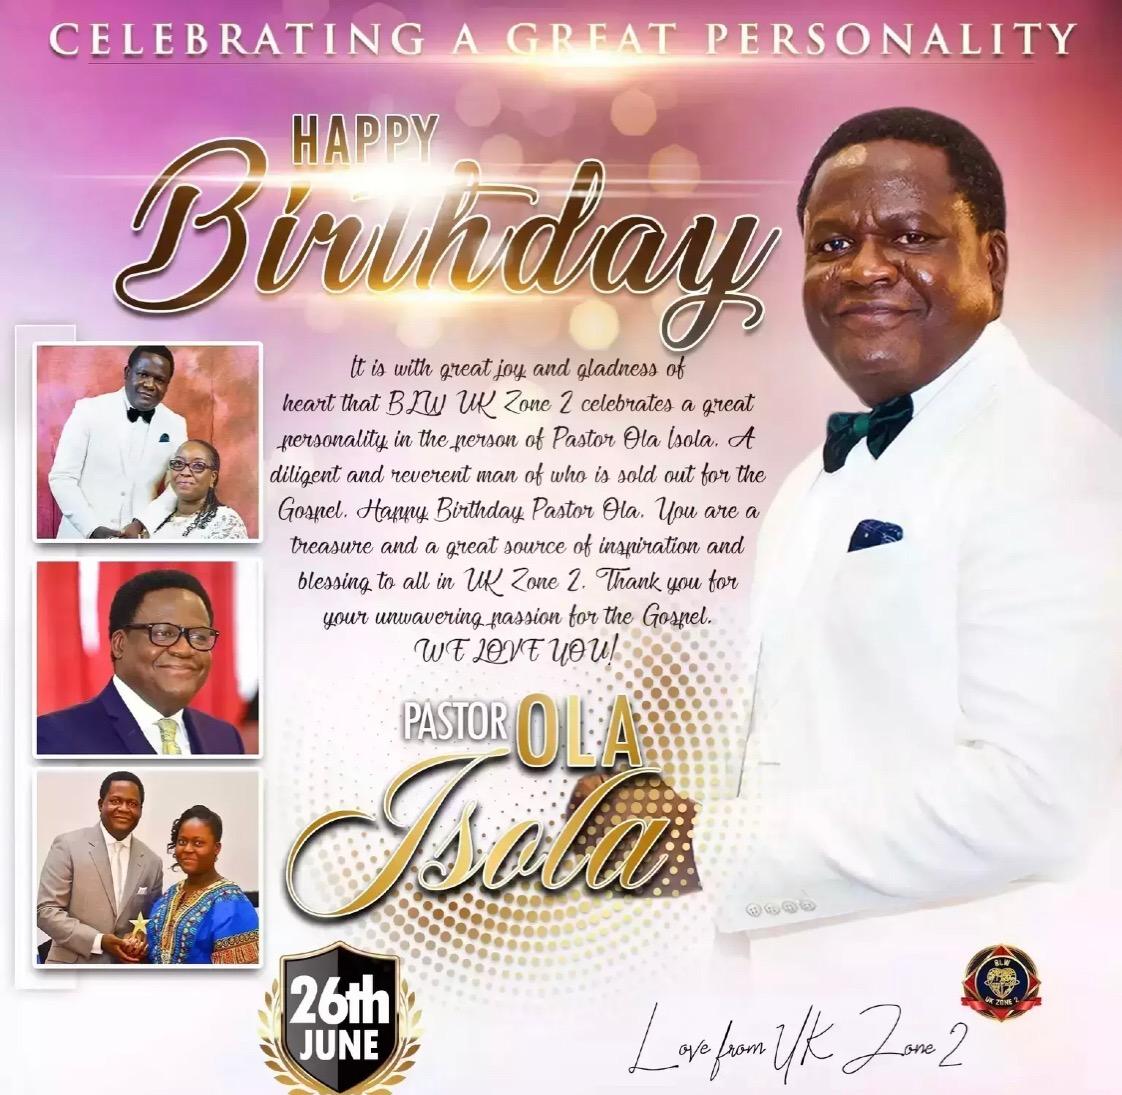 🎈Happy birthday Pastor Ola Isola